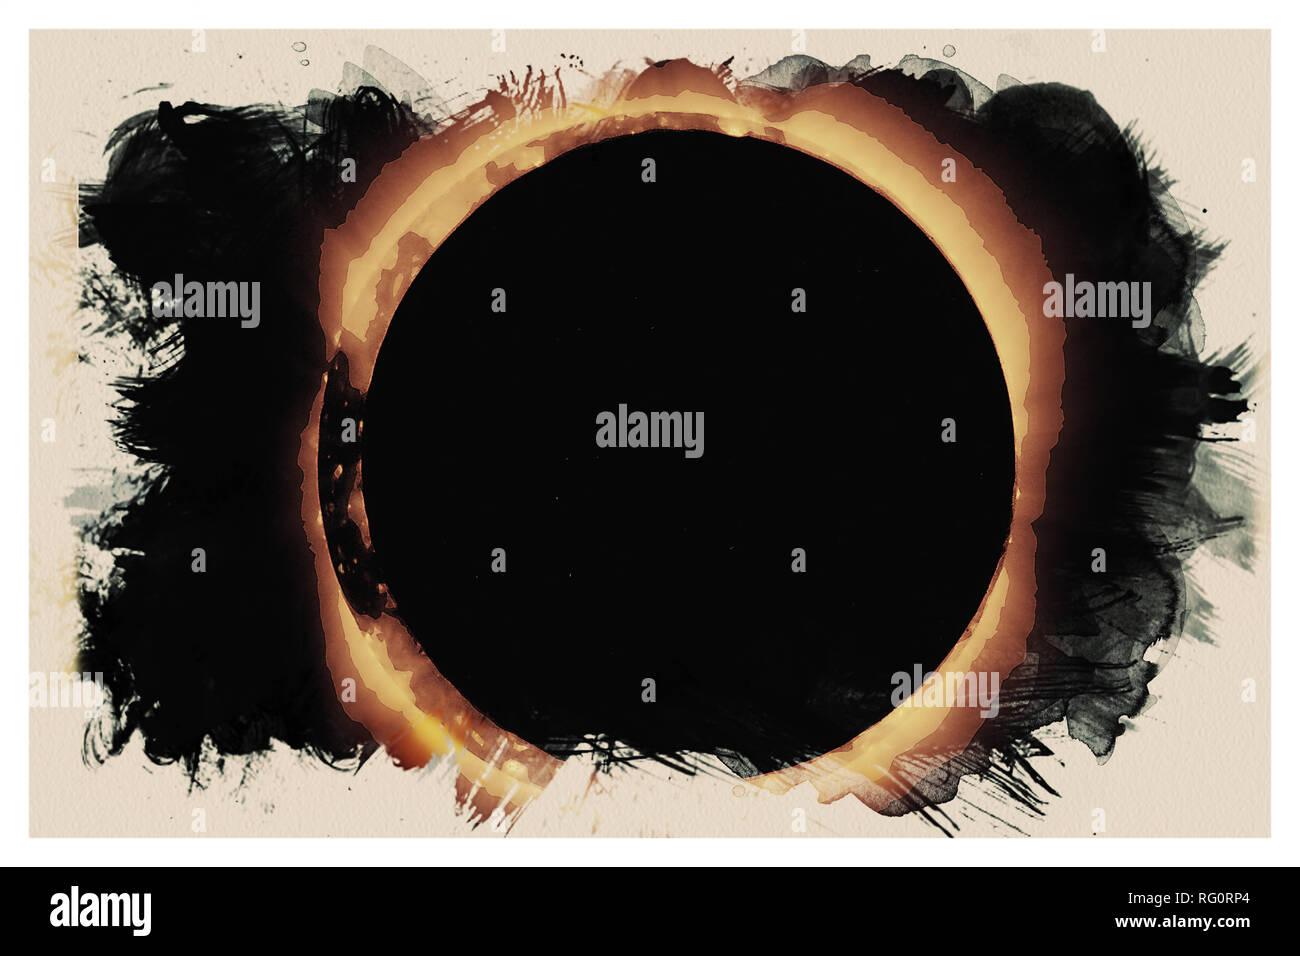 Solar Eclipse 2017 4.jpg - RG0RP5 - Stock Image